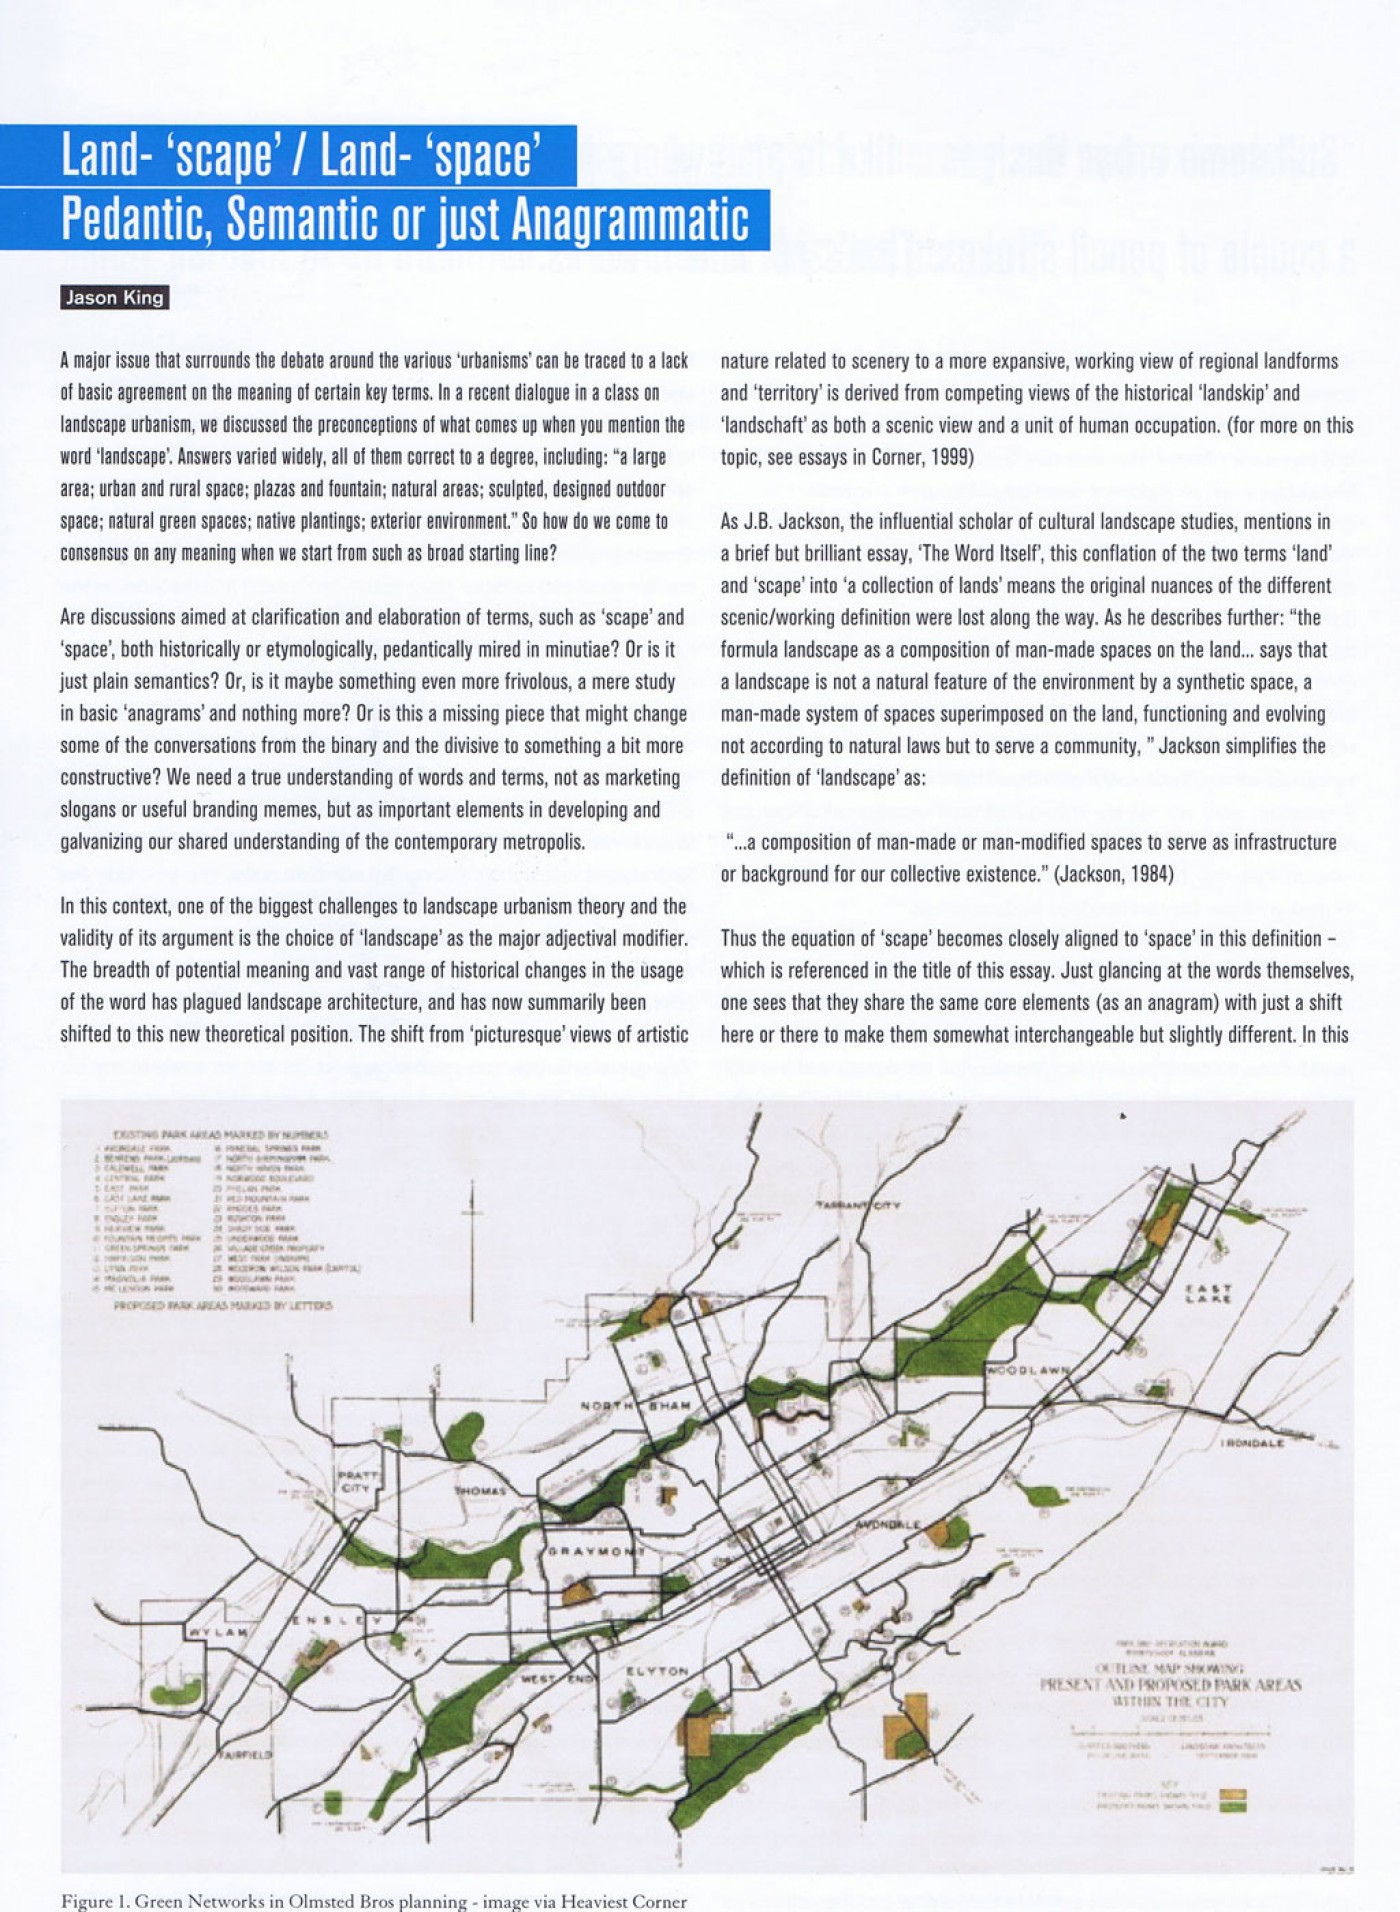 006 Landscape Architecture Essay Atlantis Web Stunning Argumentative Topics 1400